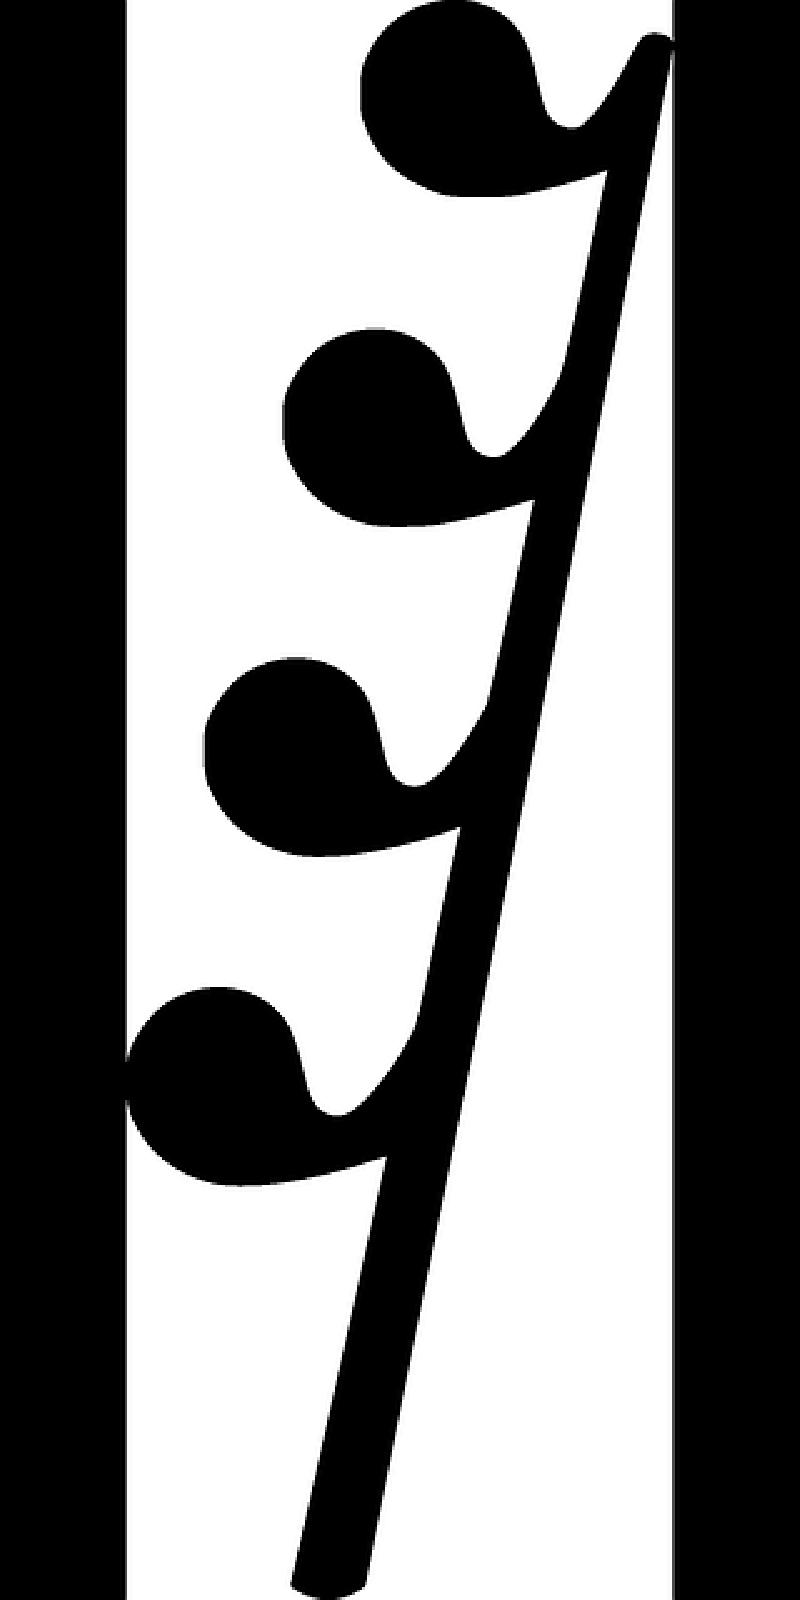 800x1600 Music, Symbol, Symbols, Musical, Notes, Writing, Rest